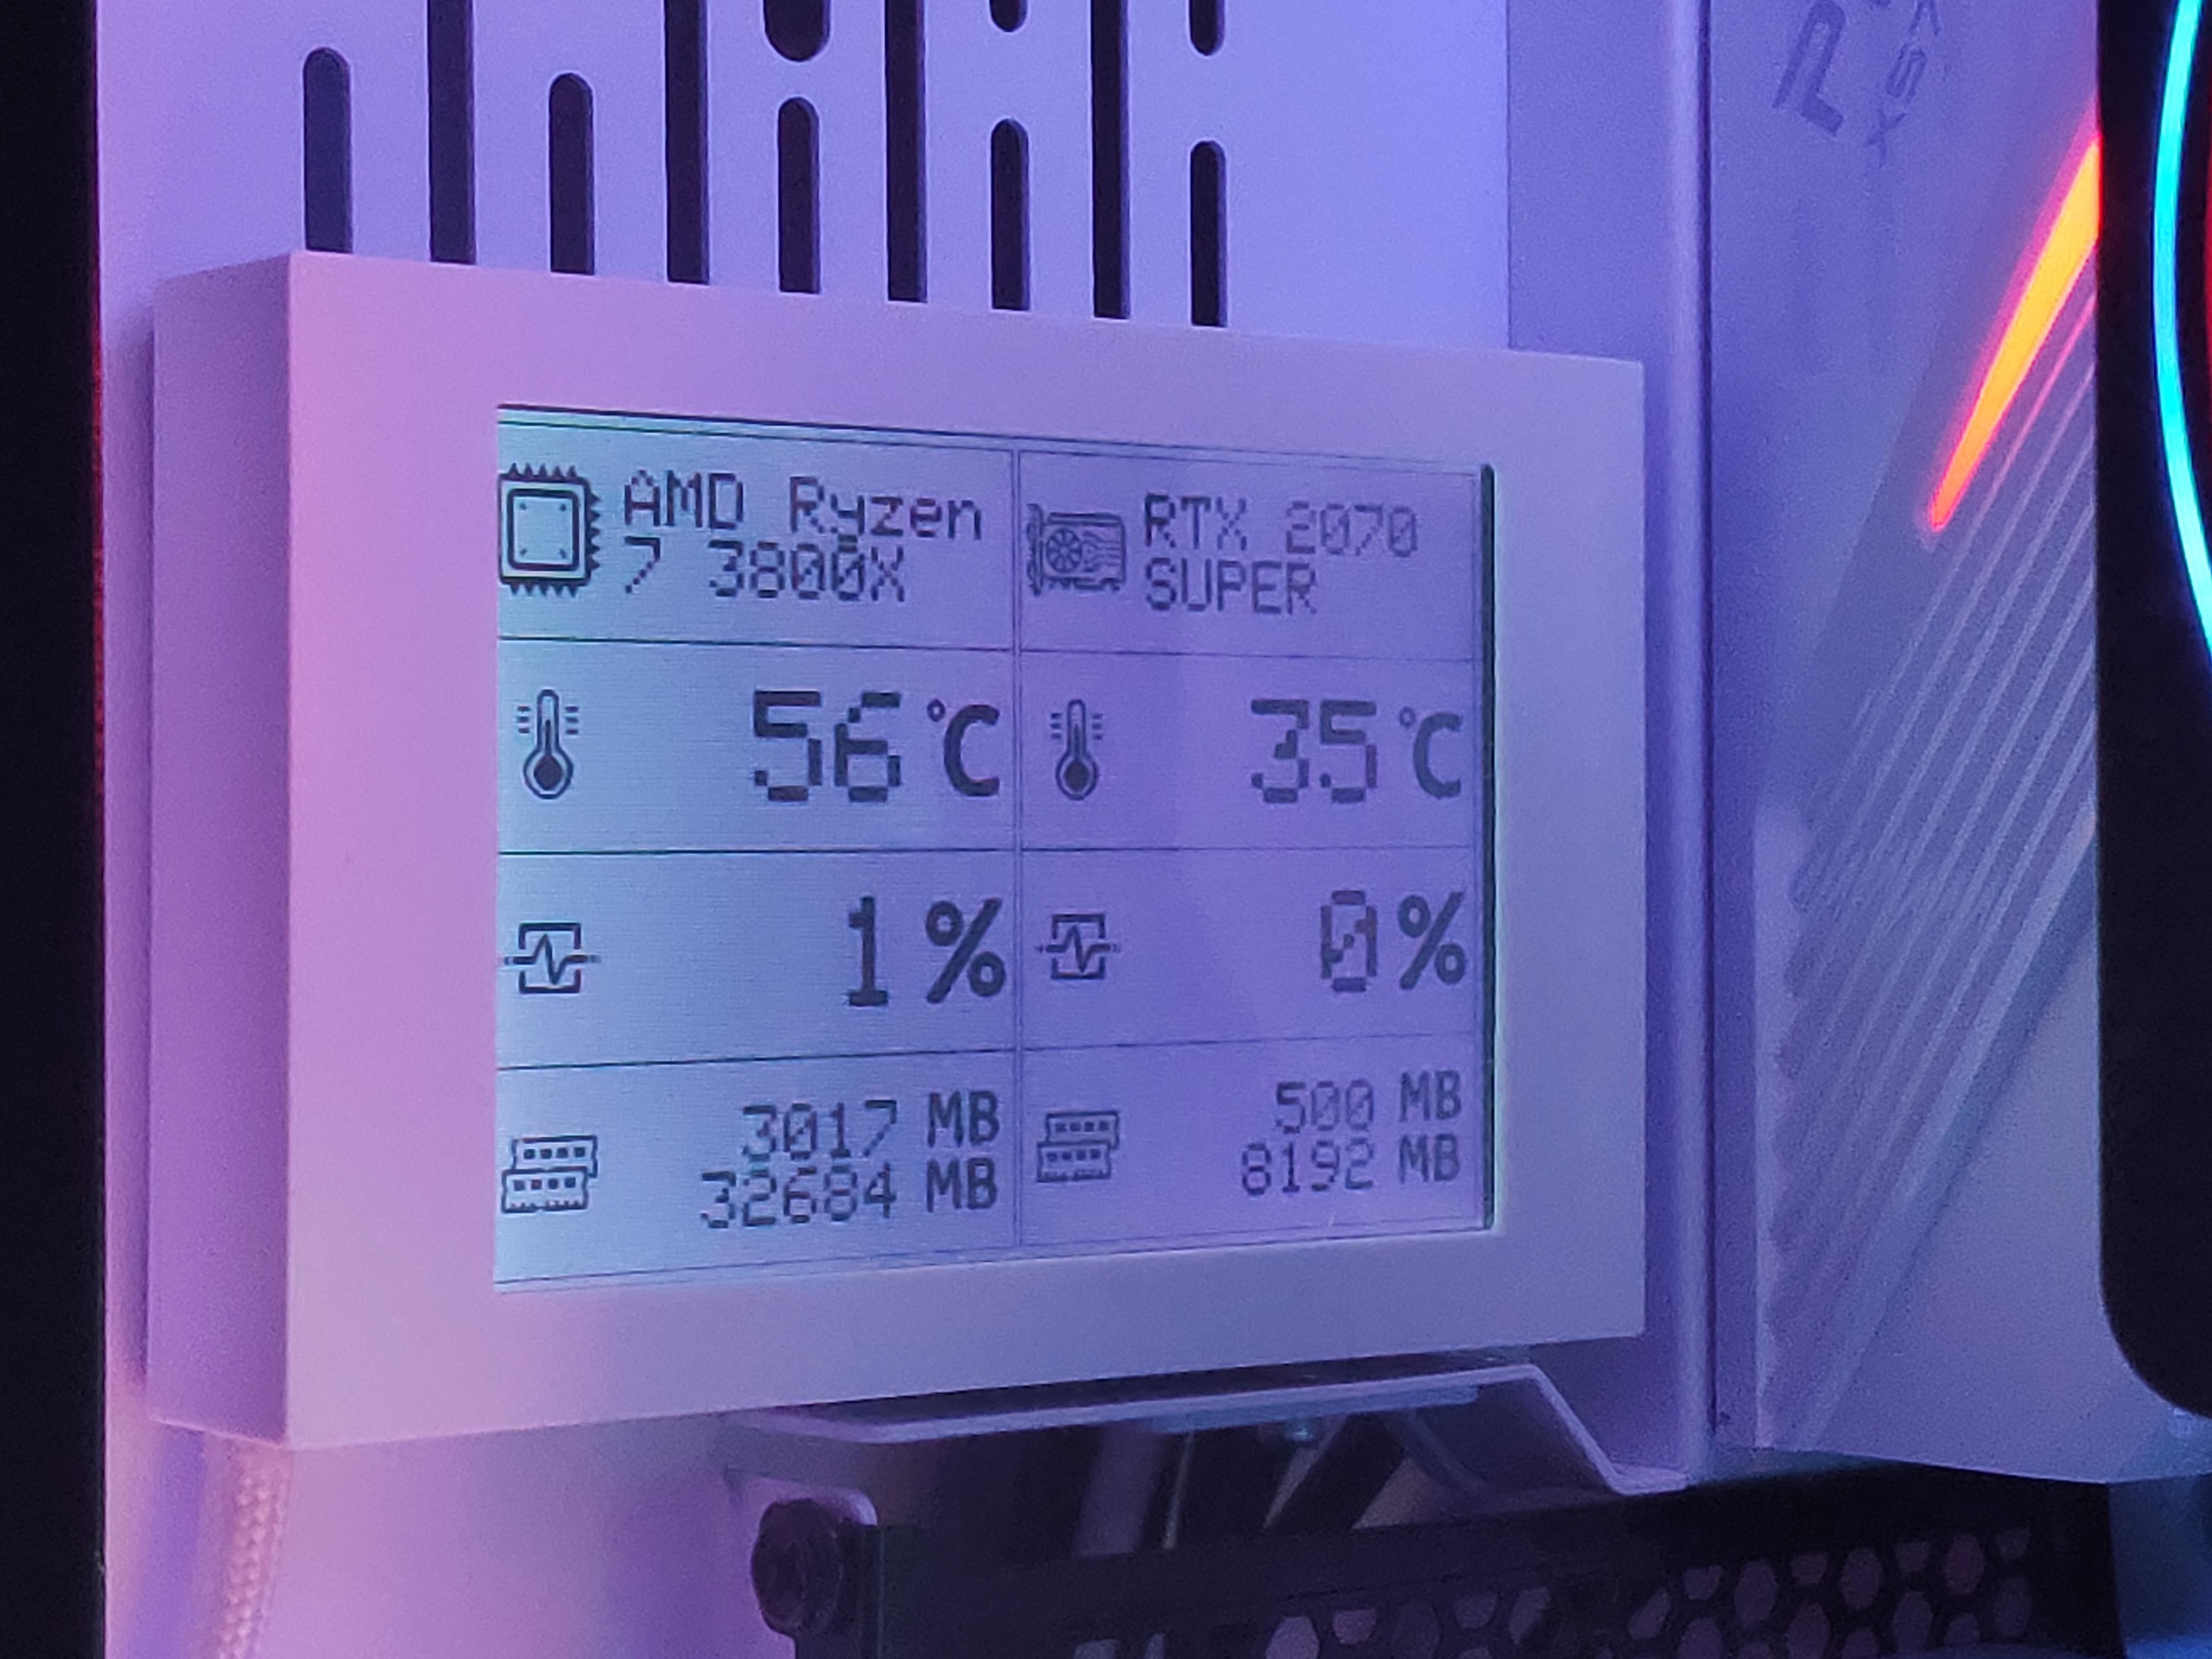 PC Hardware Monitor